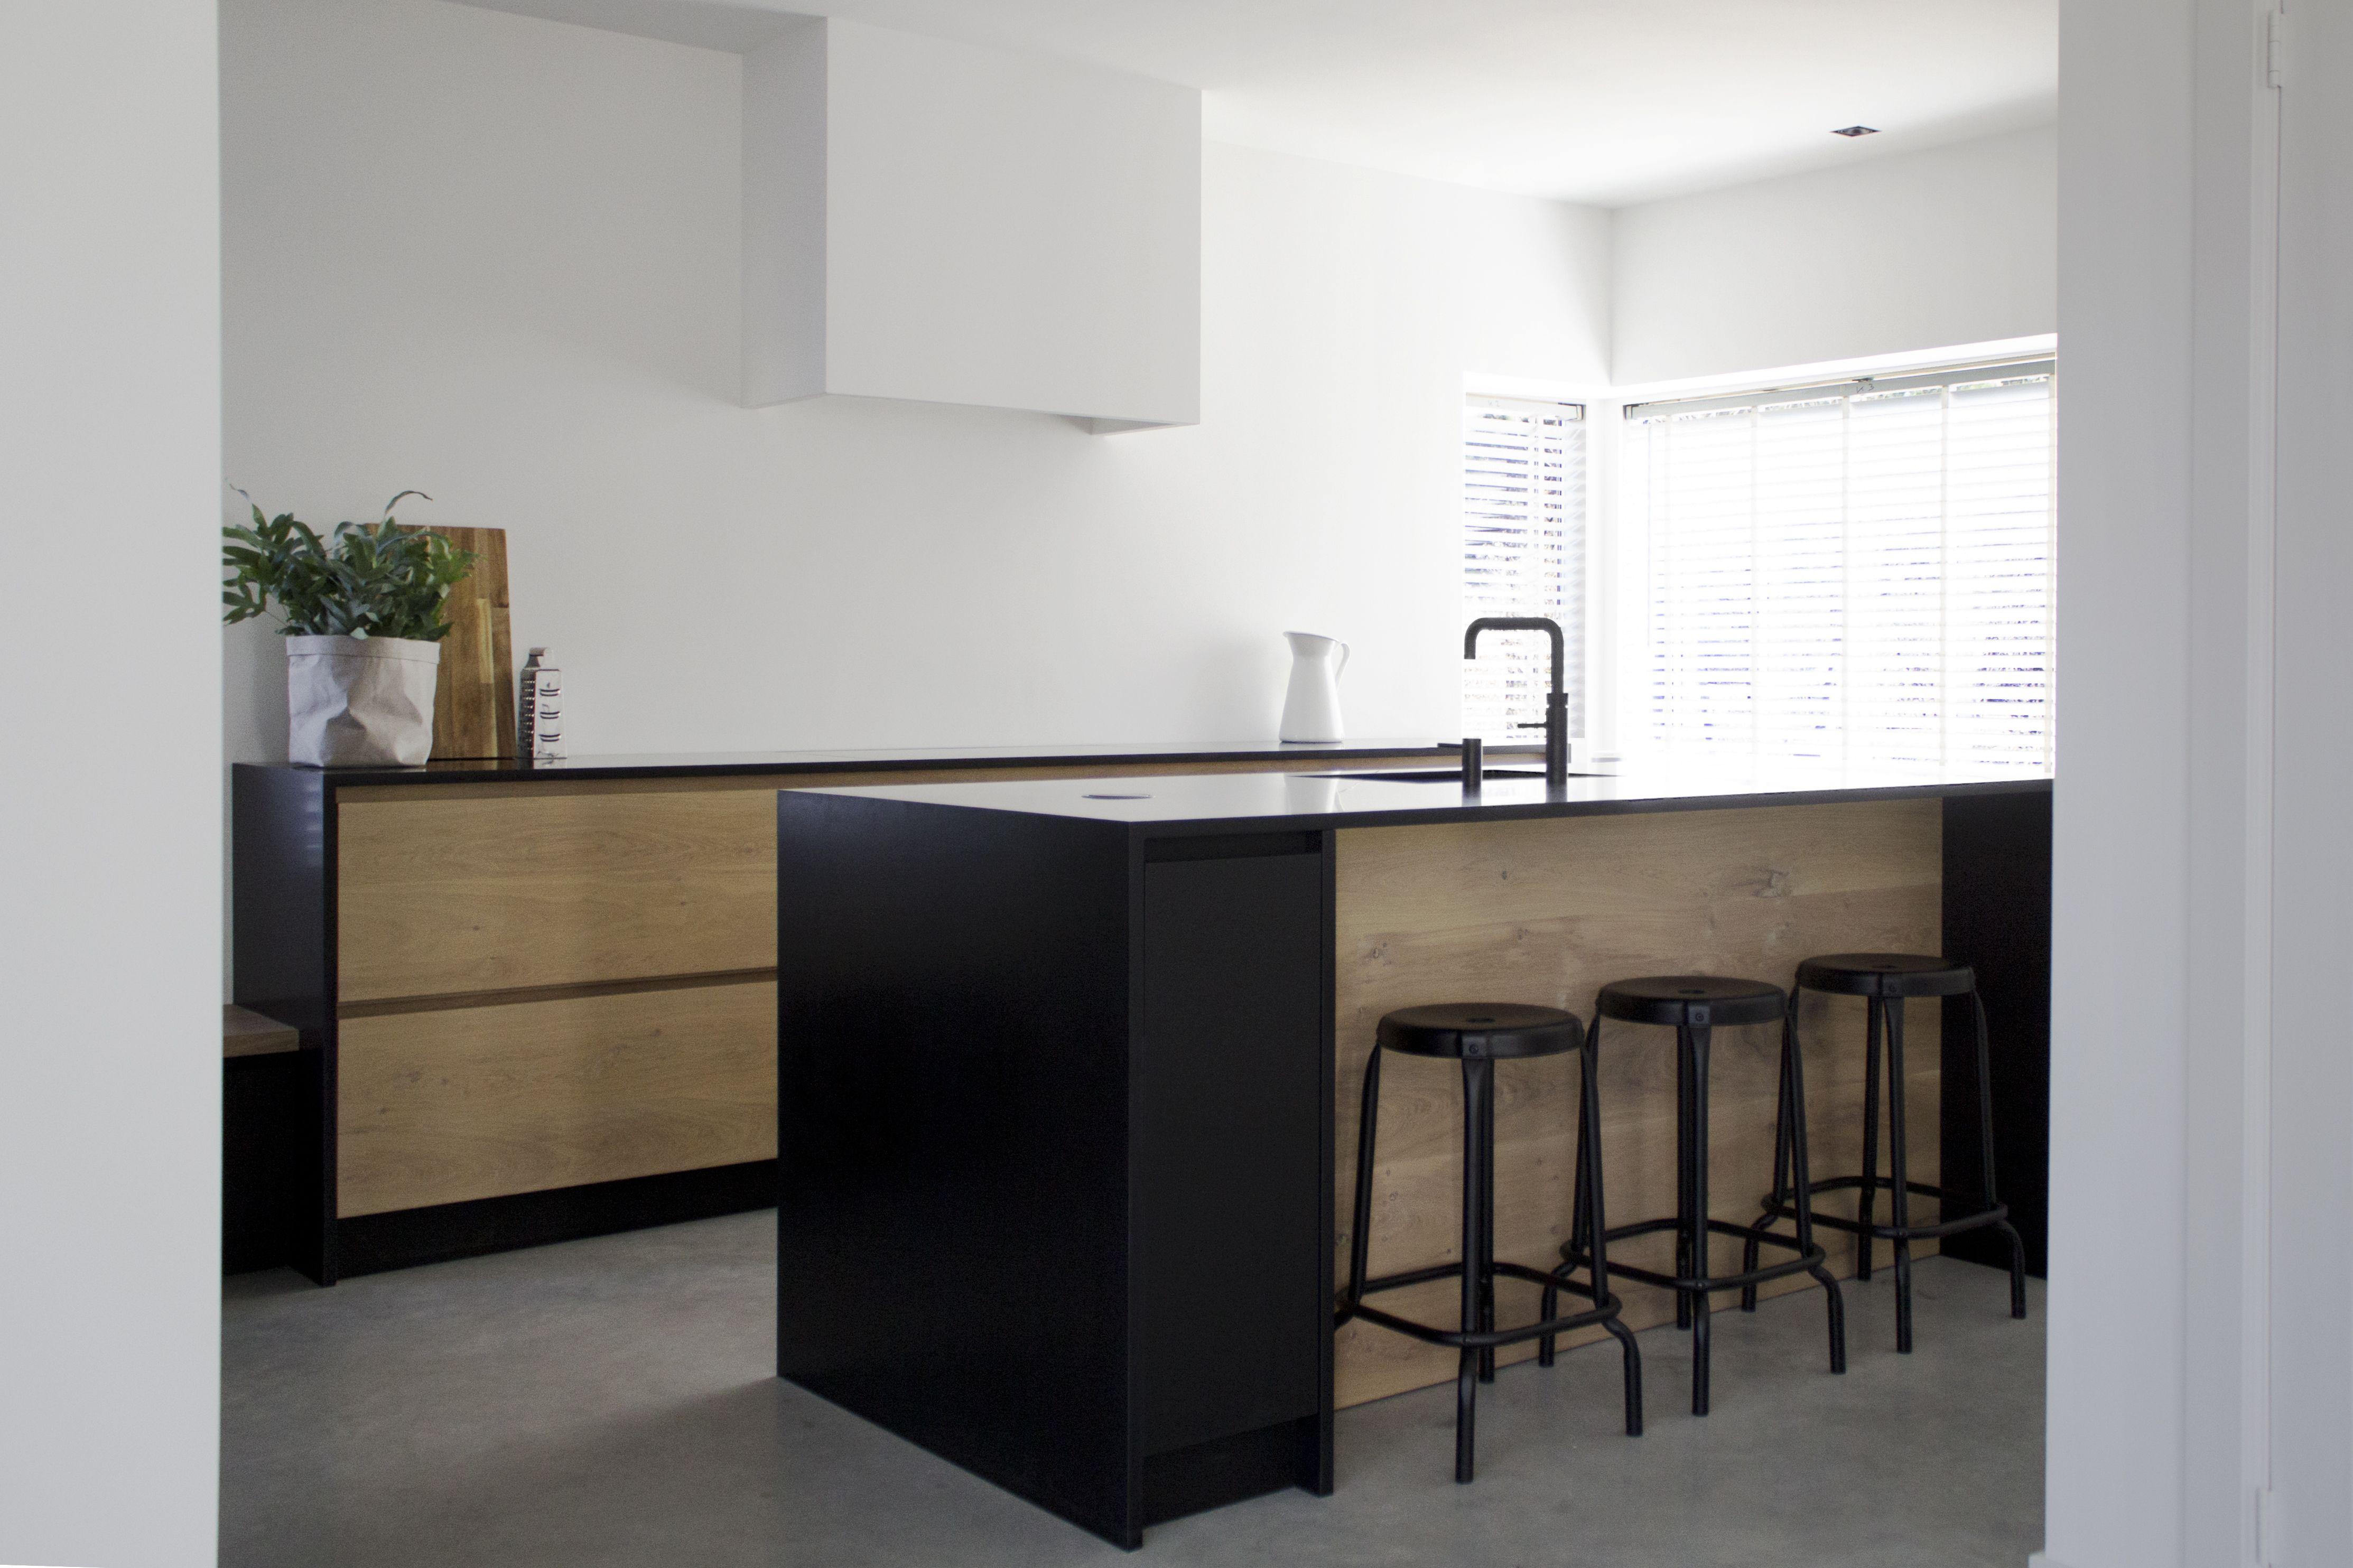 Keuken Organizer Ontwerpen : Moderne keuken van mat zwart arpa fenix hout robert tediek